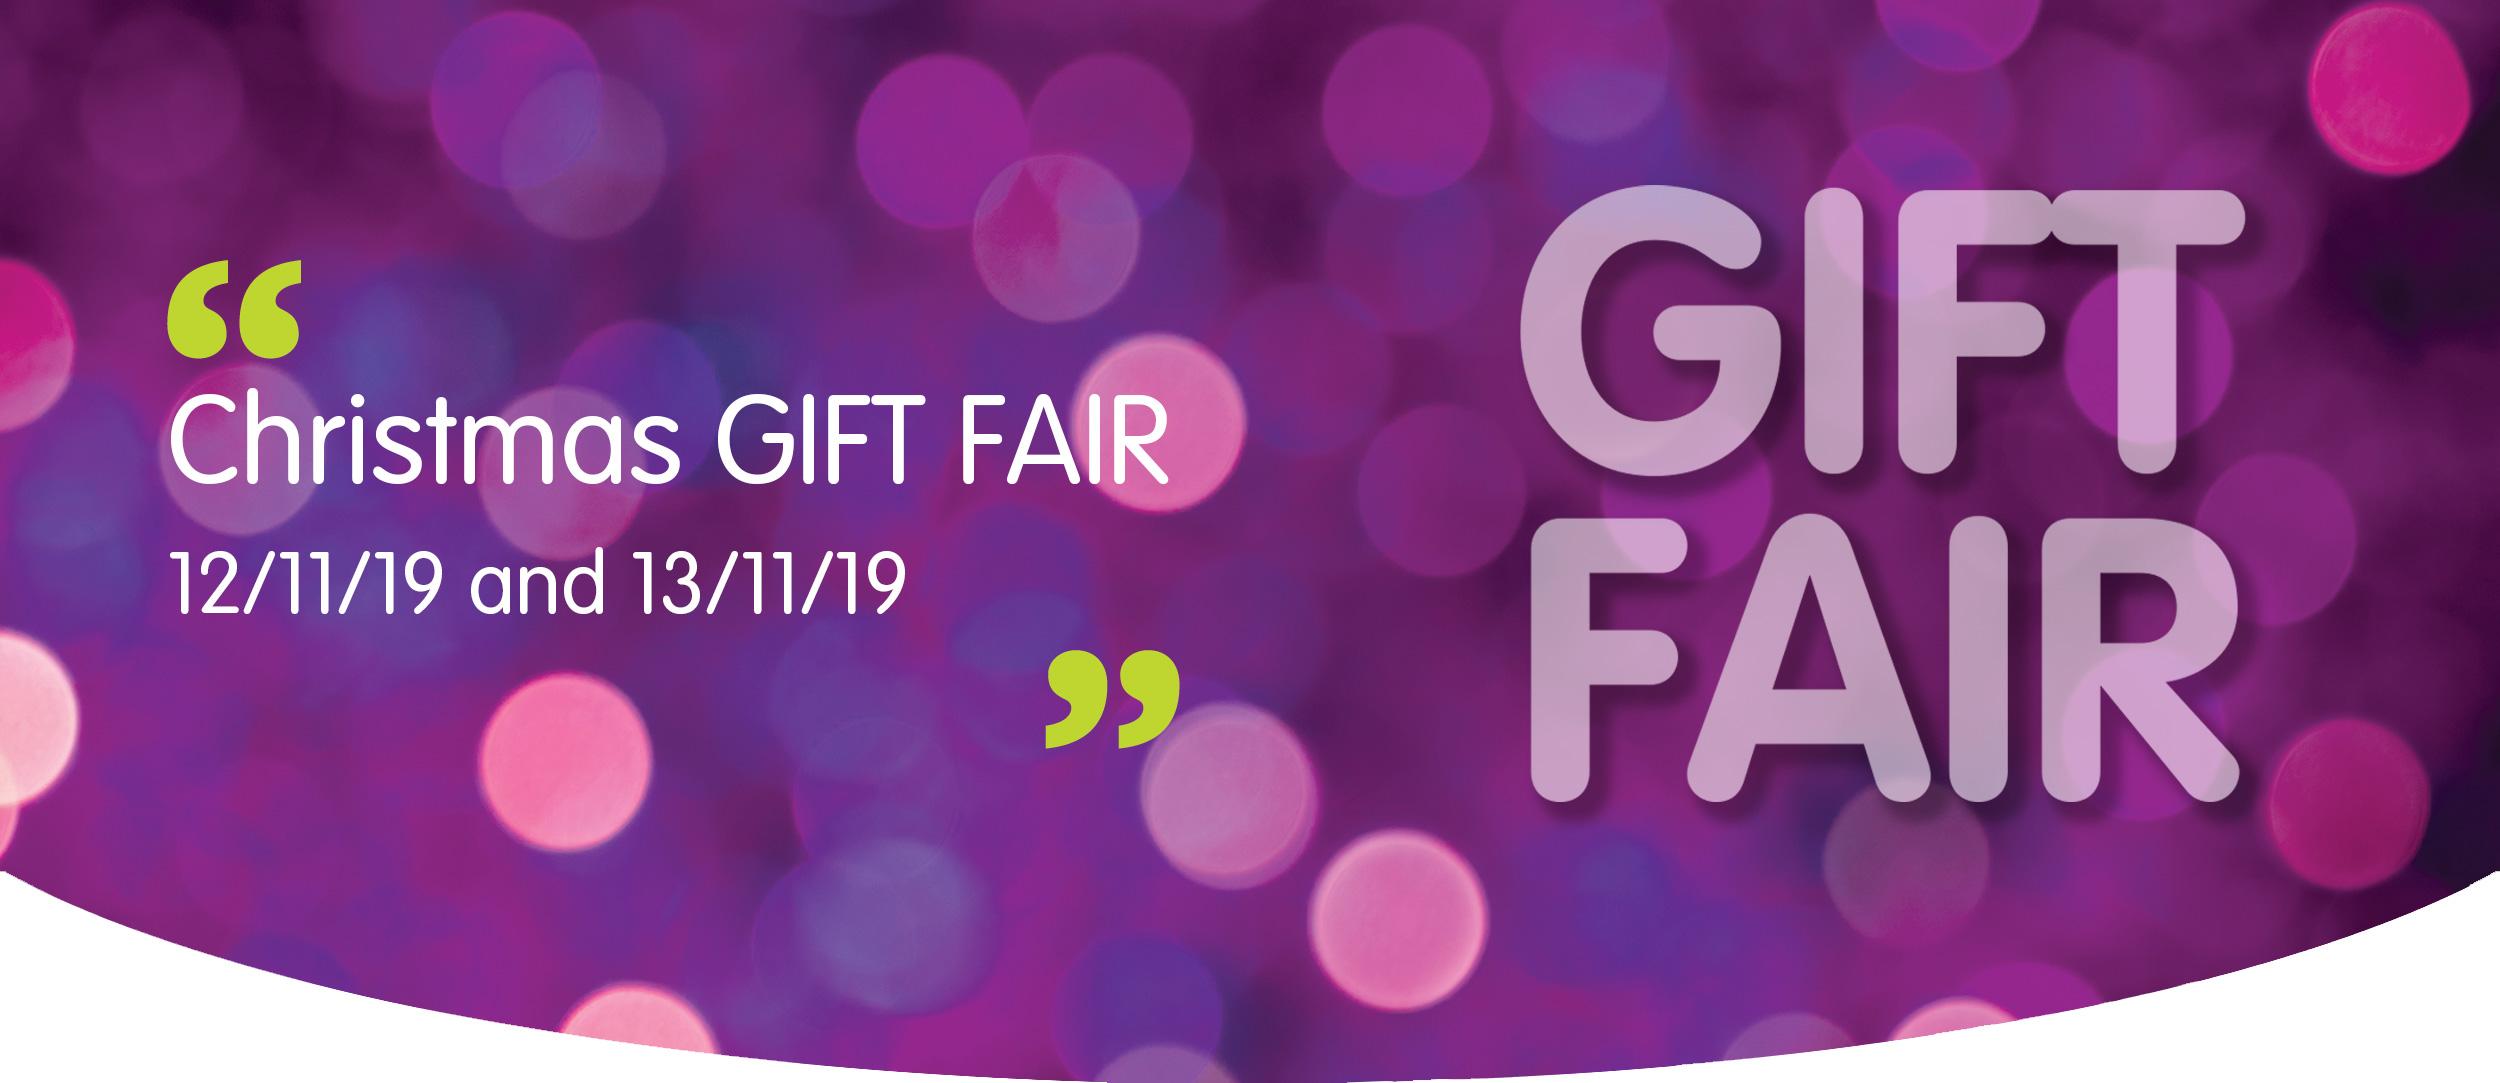 xmas-gift-fair